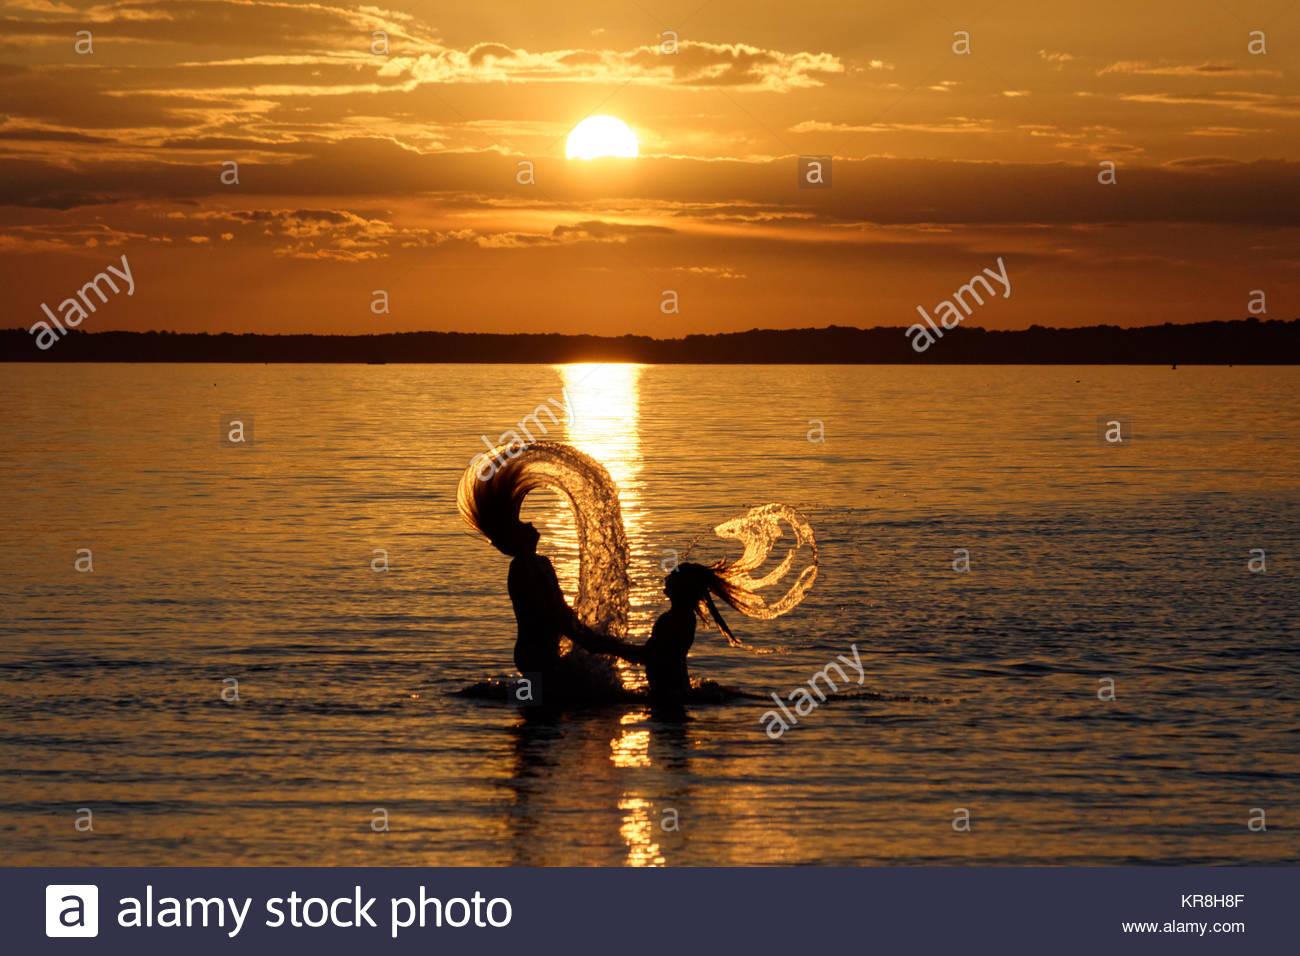 mermaids - Stock Image